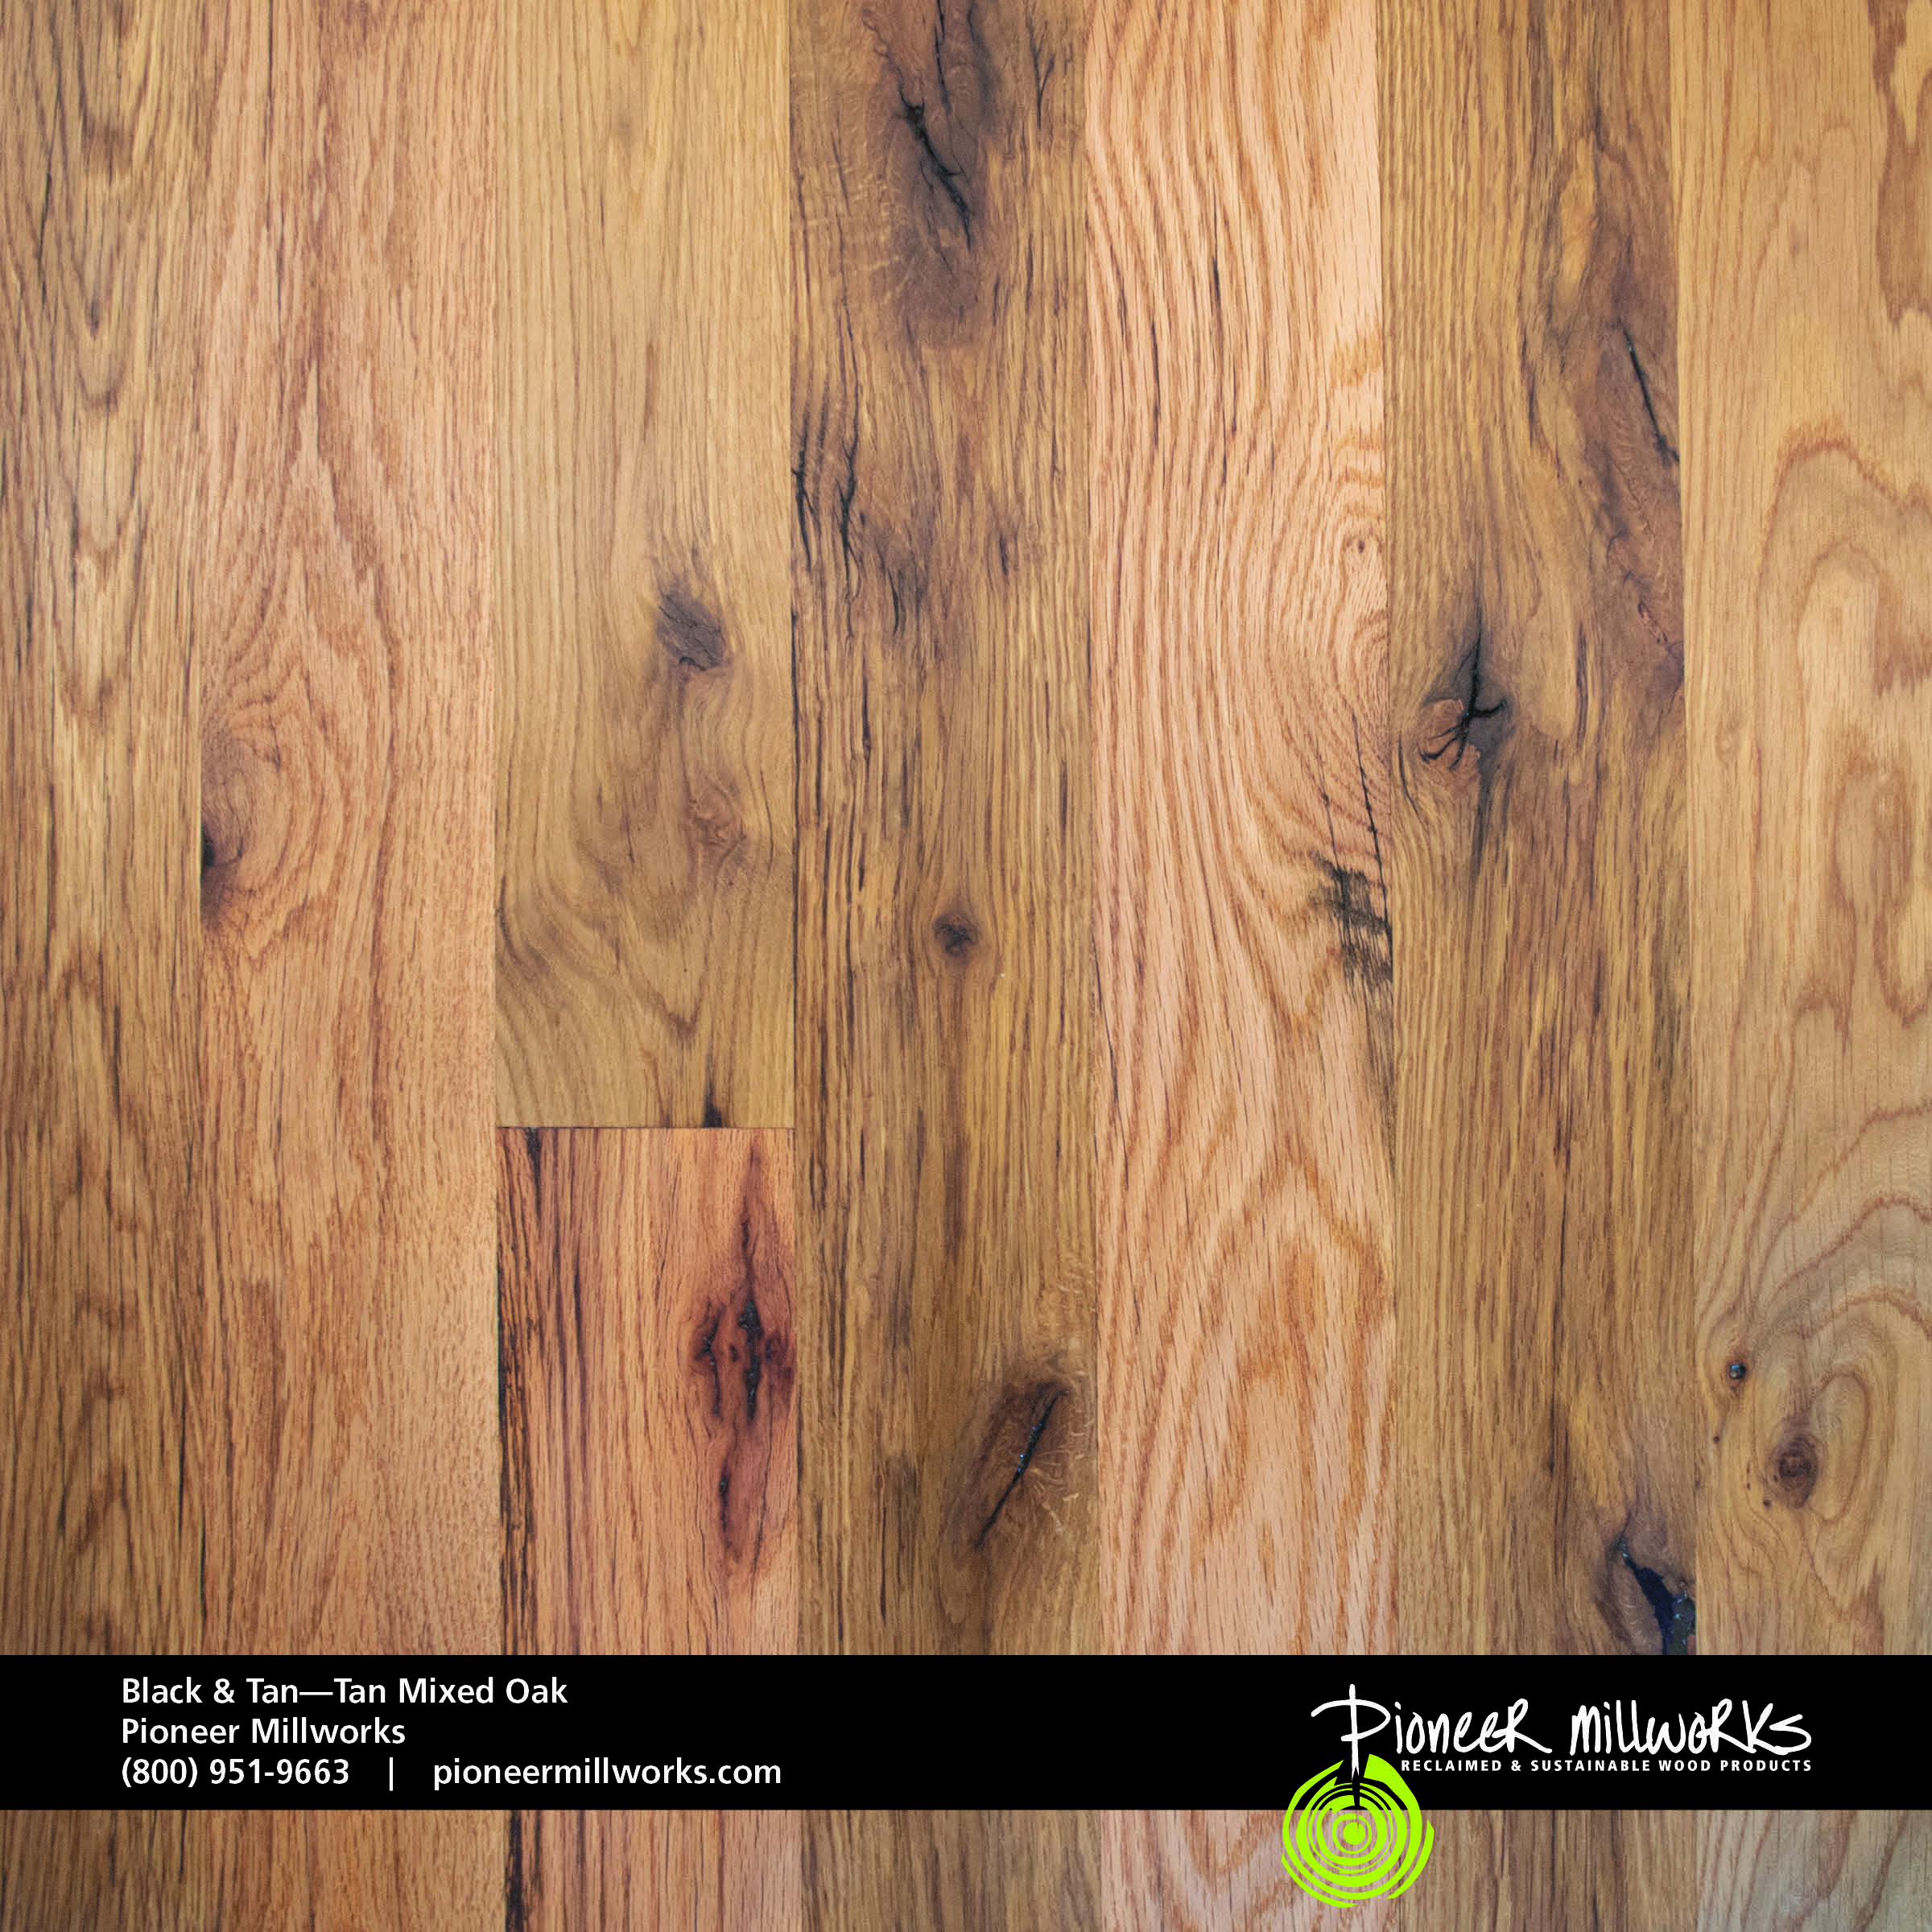 Black Tan Oak Pioneermillworks